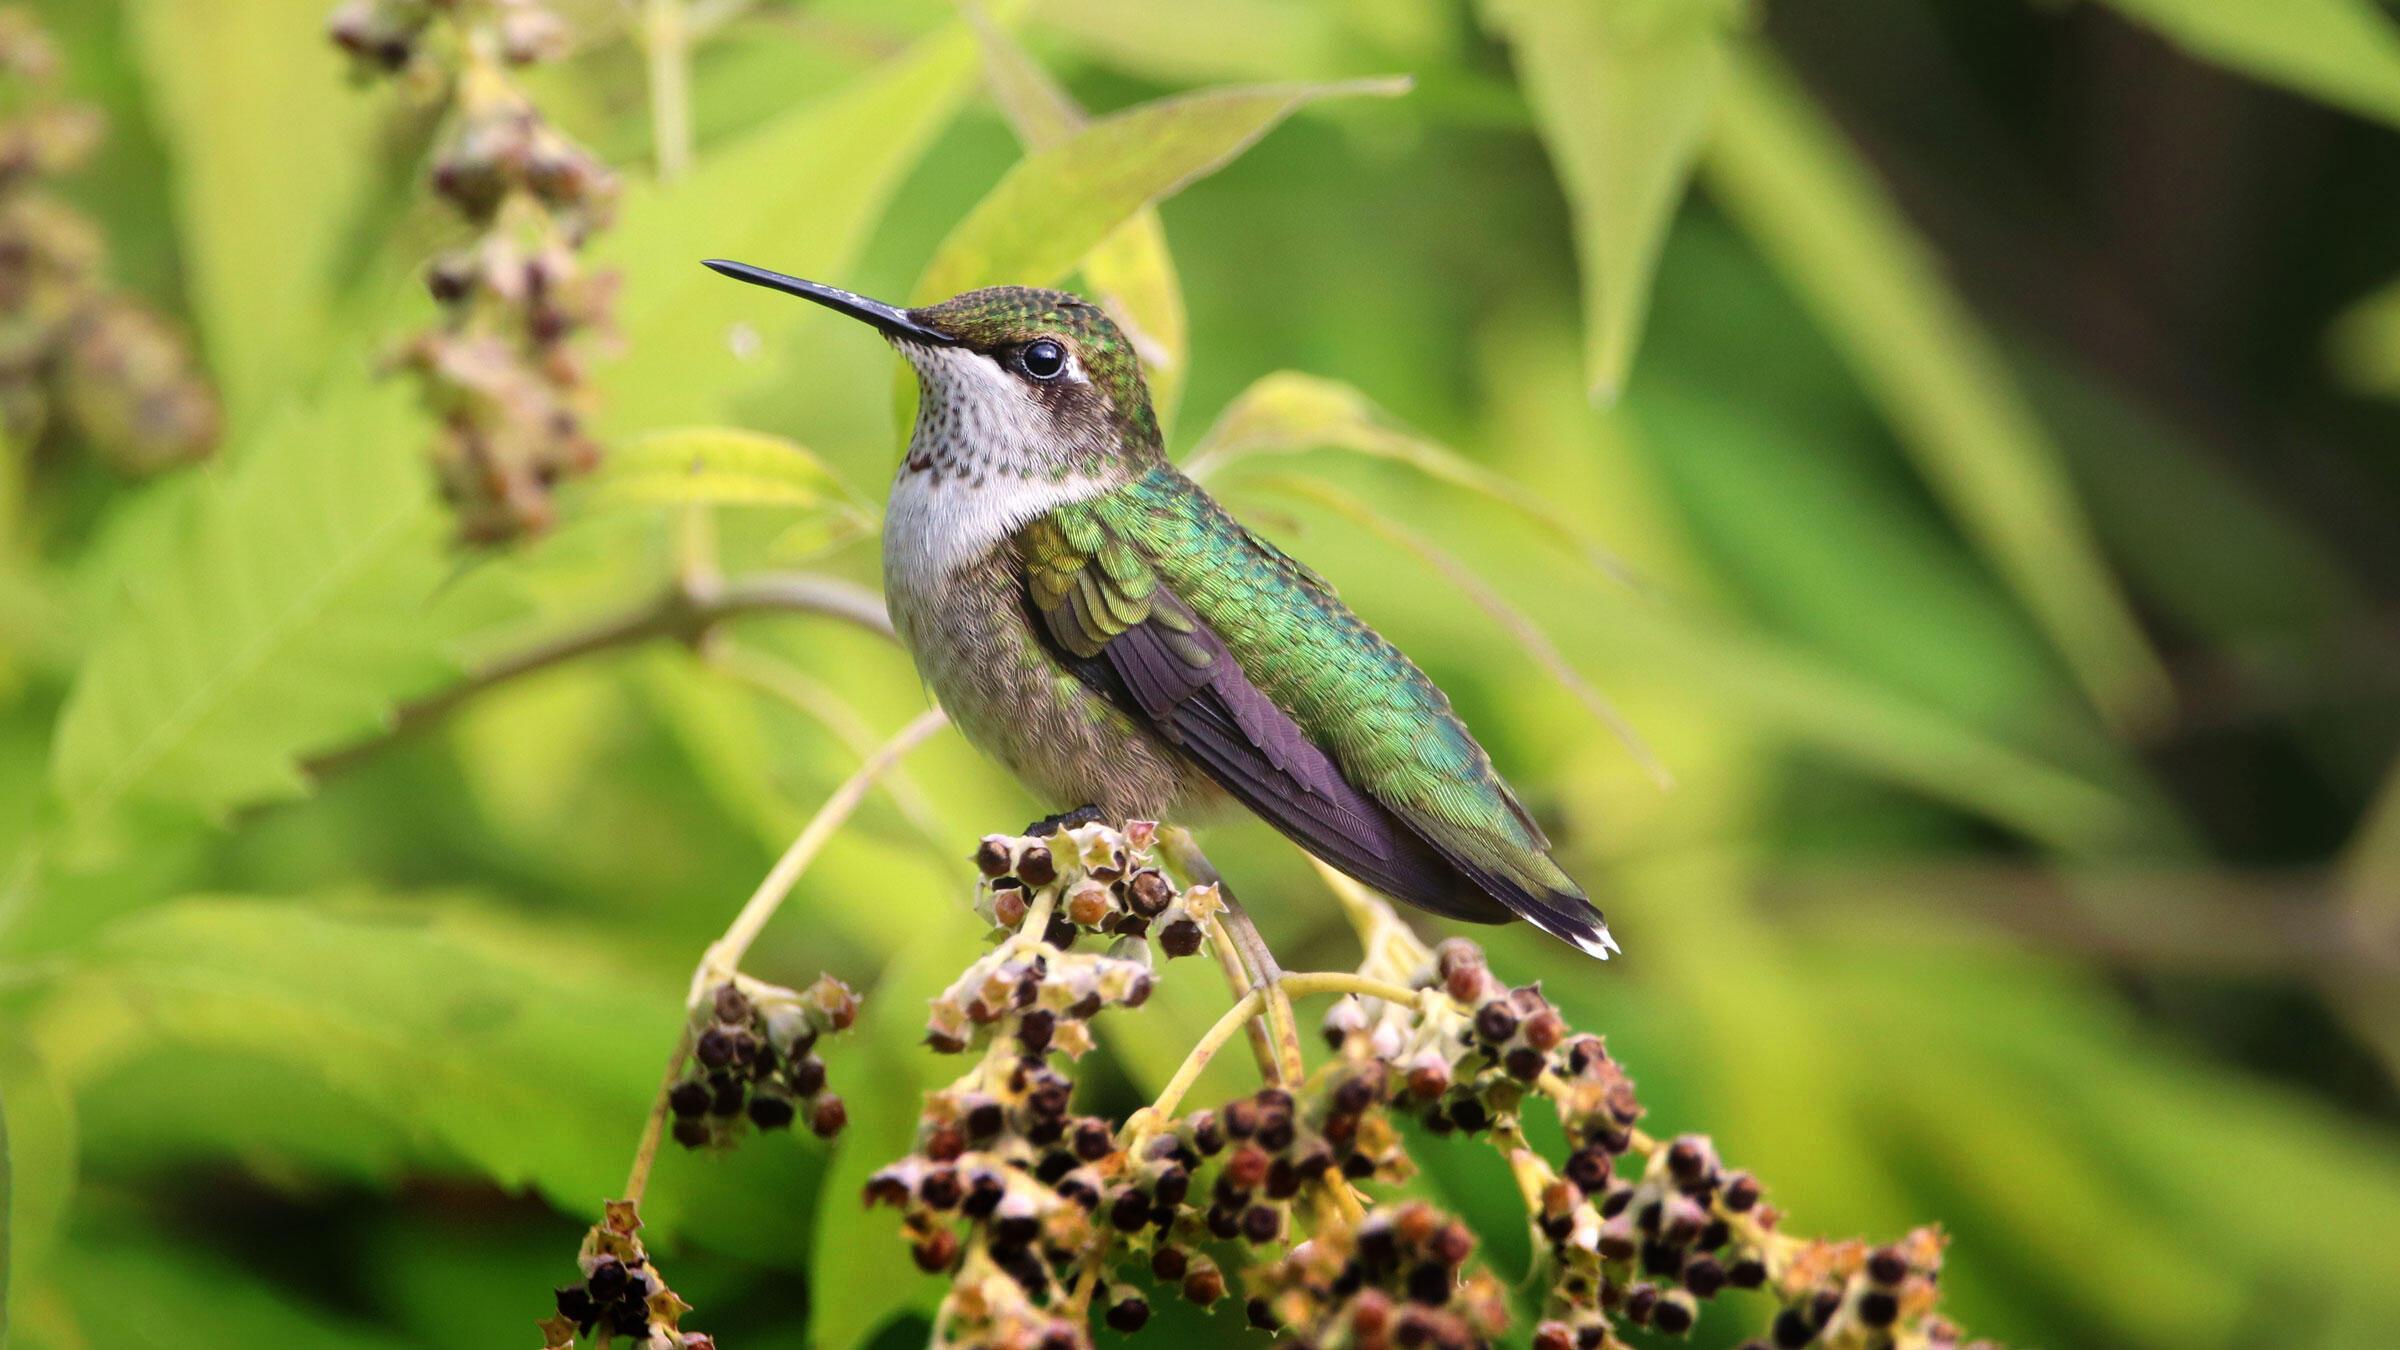 Ruby-throated Hummingbird. Jordan West/Audubon Photography Awards